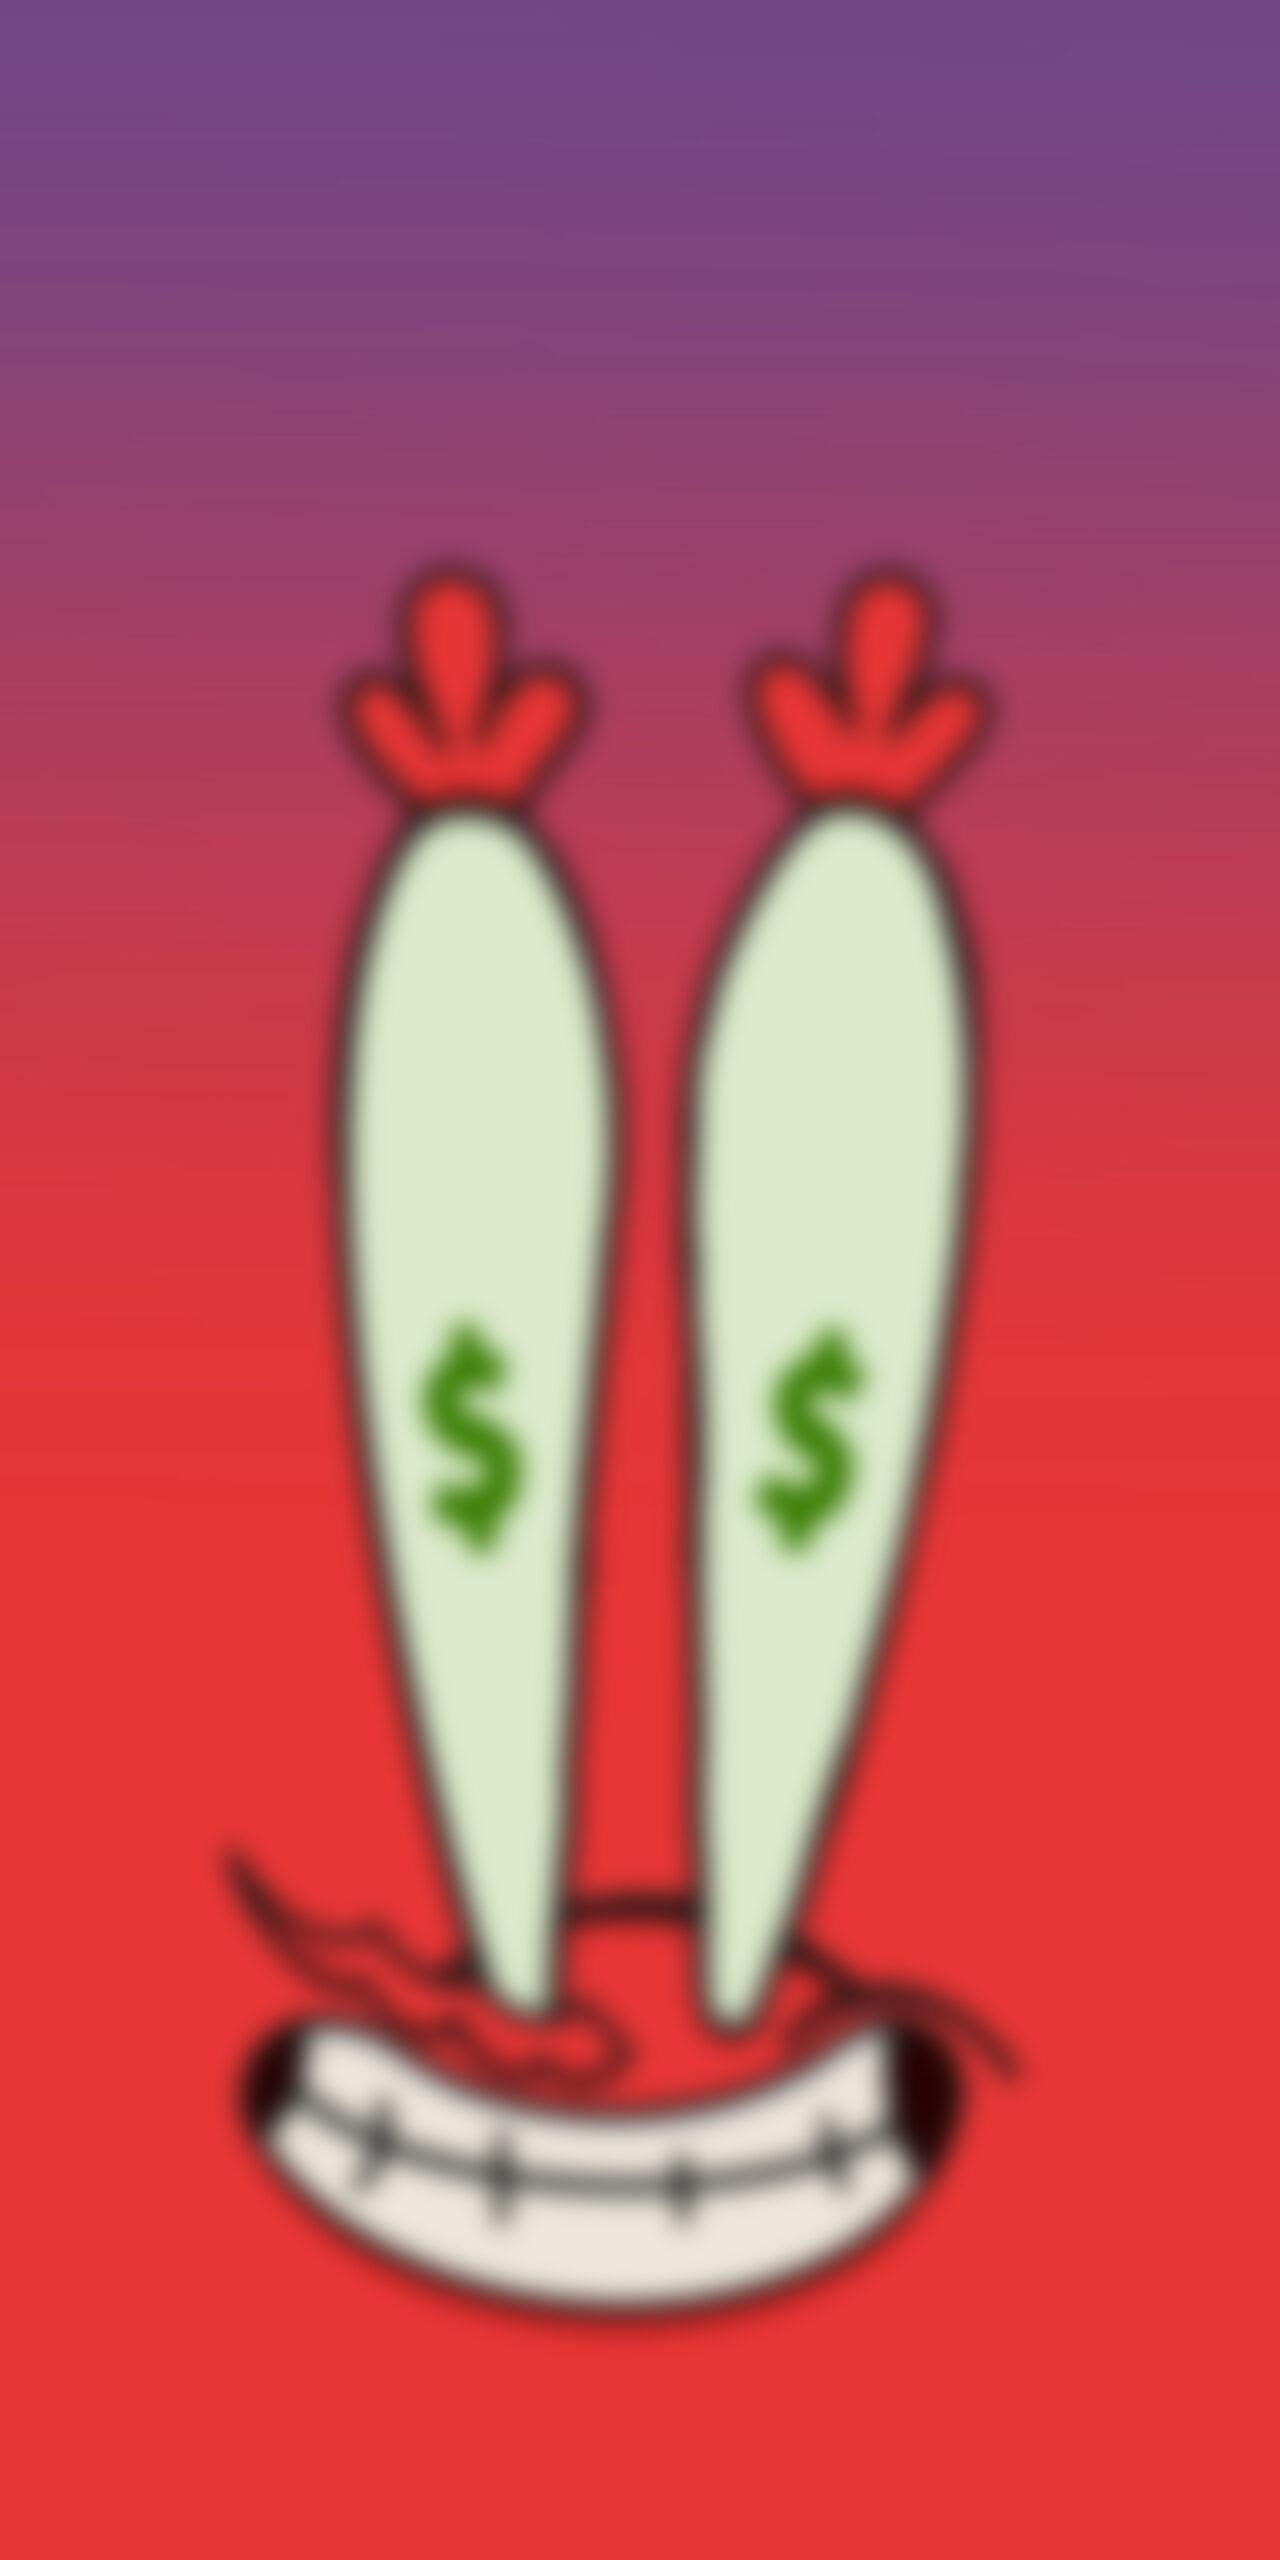 spongebob mr krabs money eyes red blur wallpaper